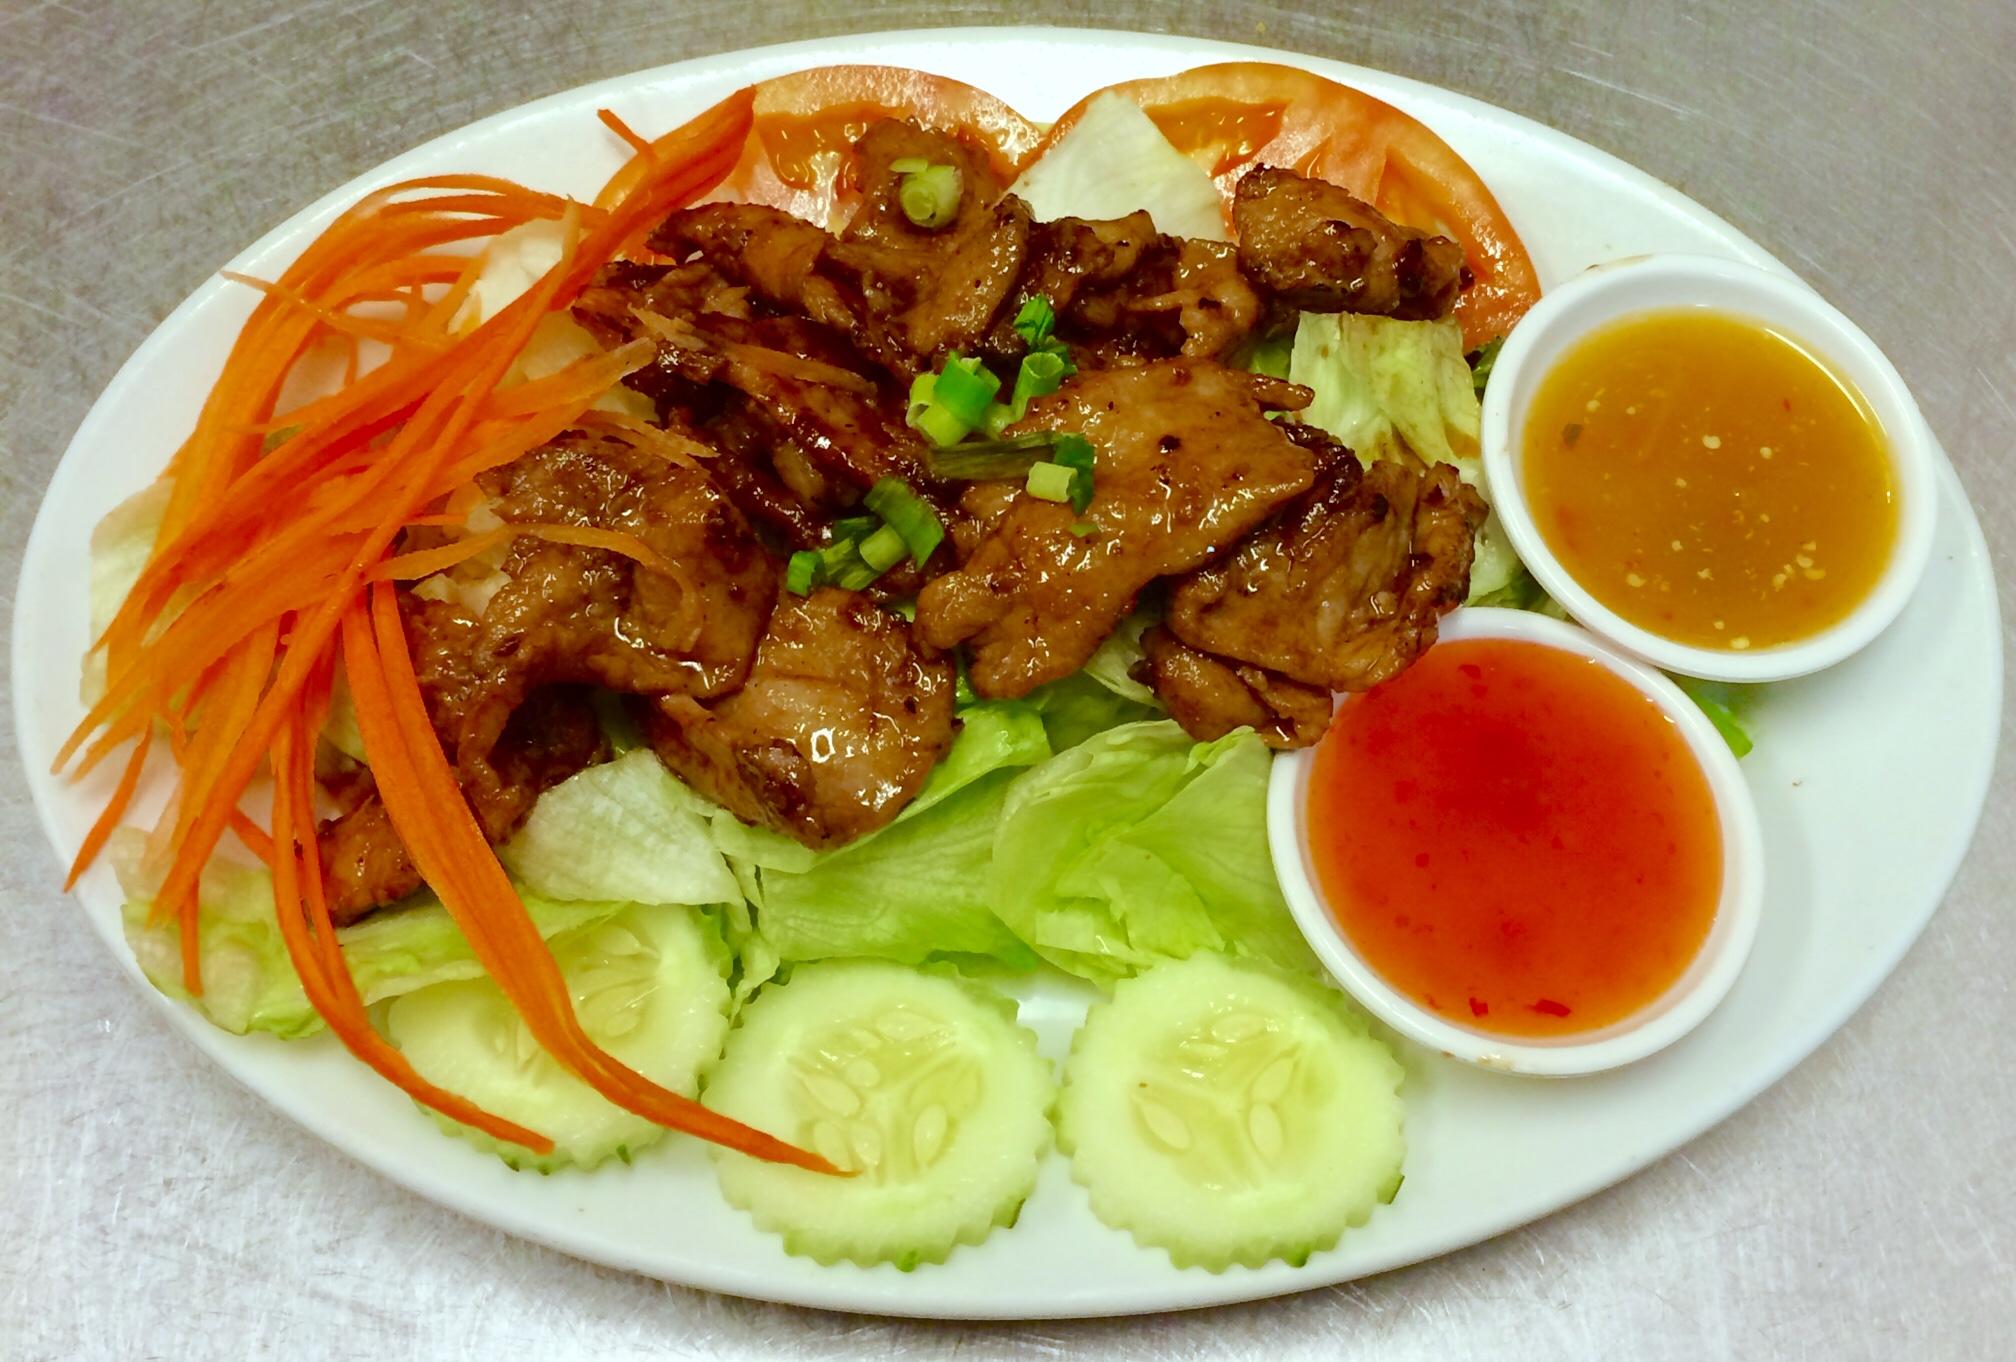 Grilled BBQ Pork